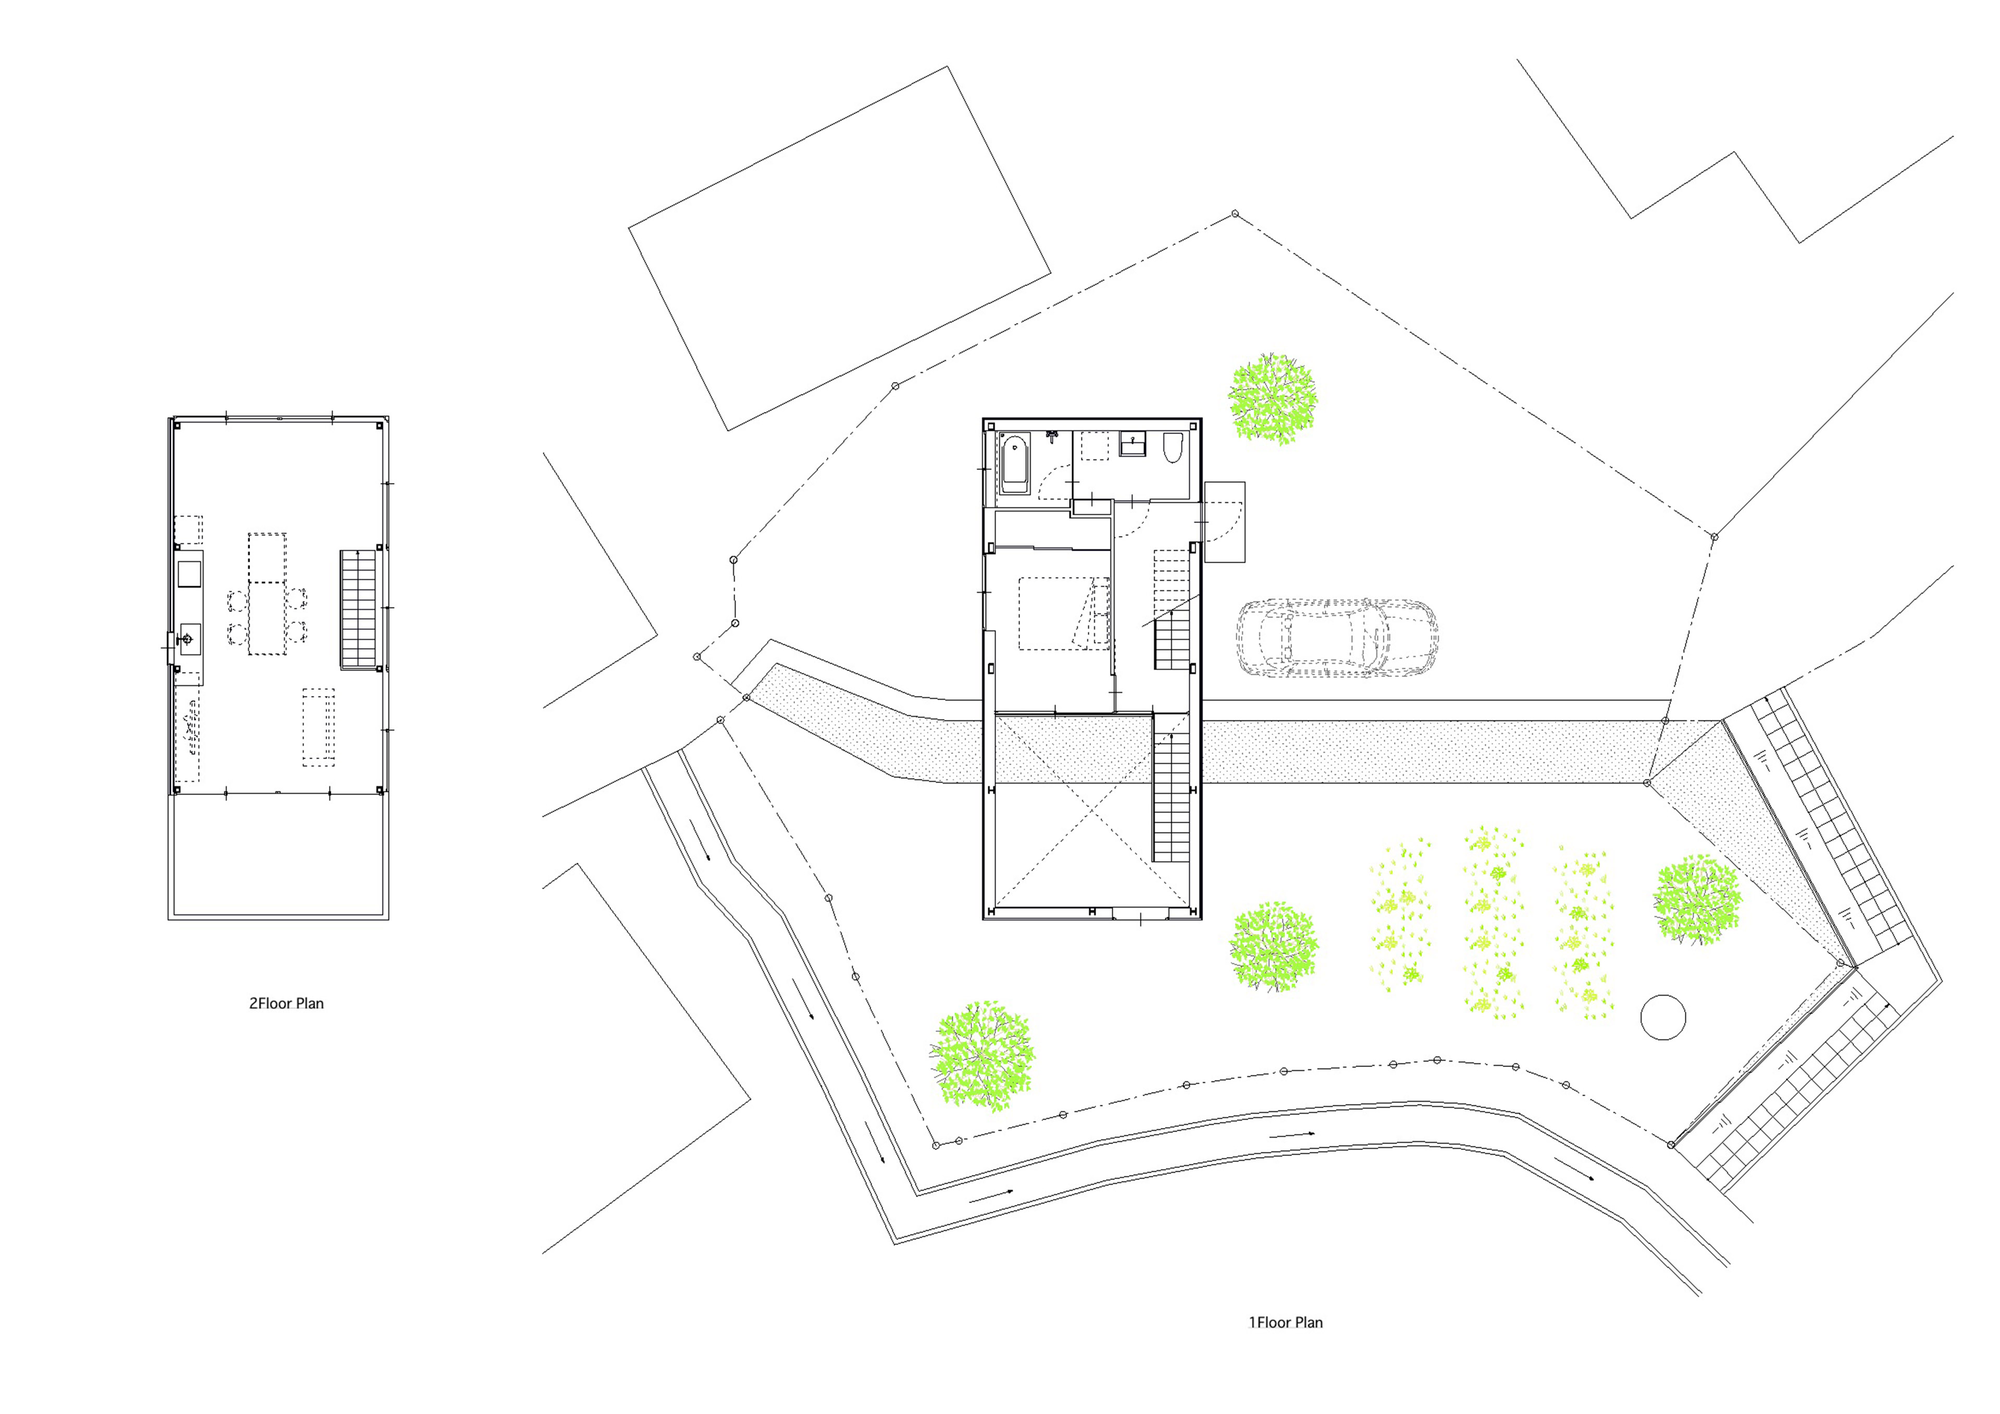 540ea175c07a808f0a000156_house-in-miyake-hidetaka-nakahara-architects-yoshio-ohno-architects_site_plan